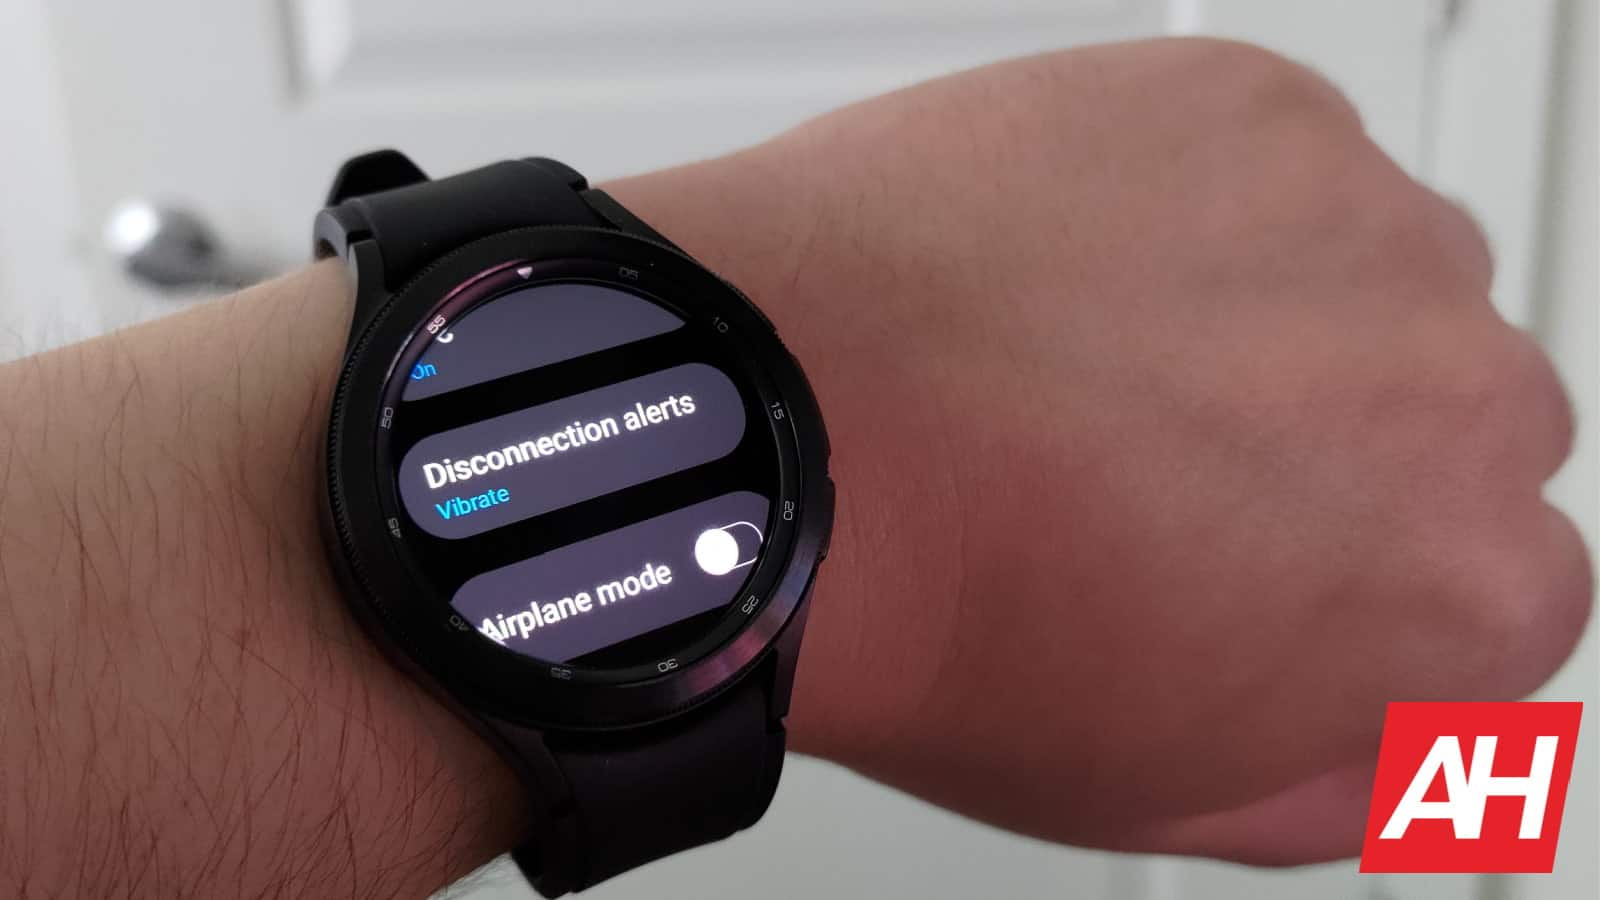 AH Galaxy Watch 4 Best Features